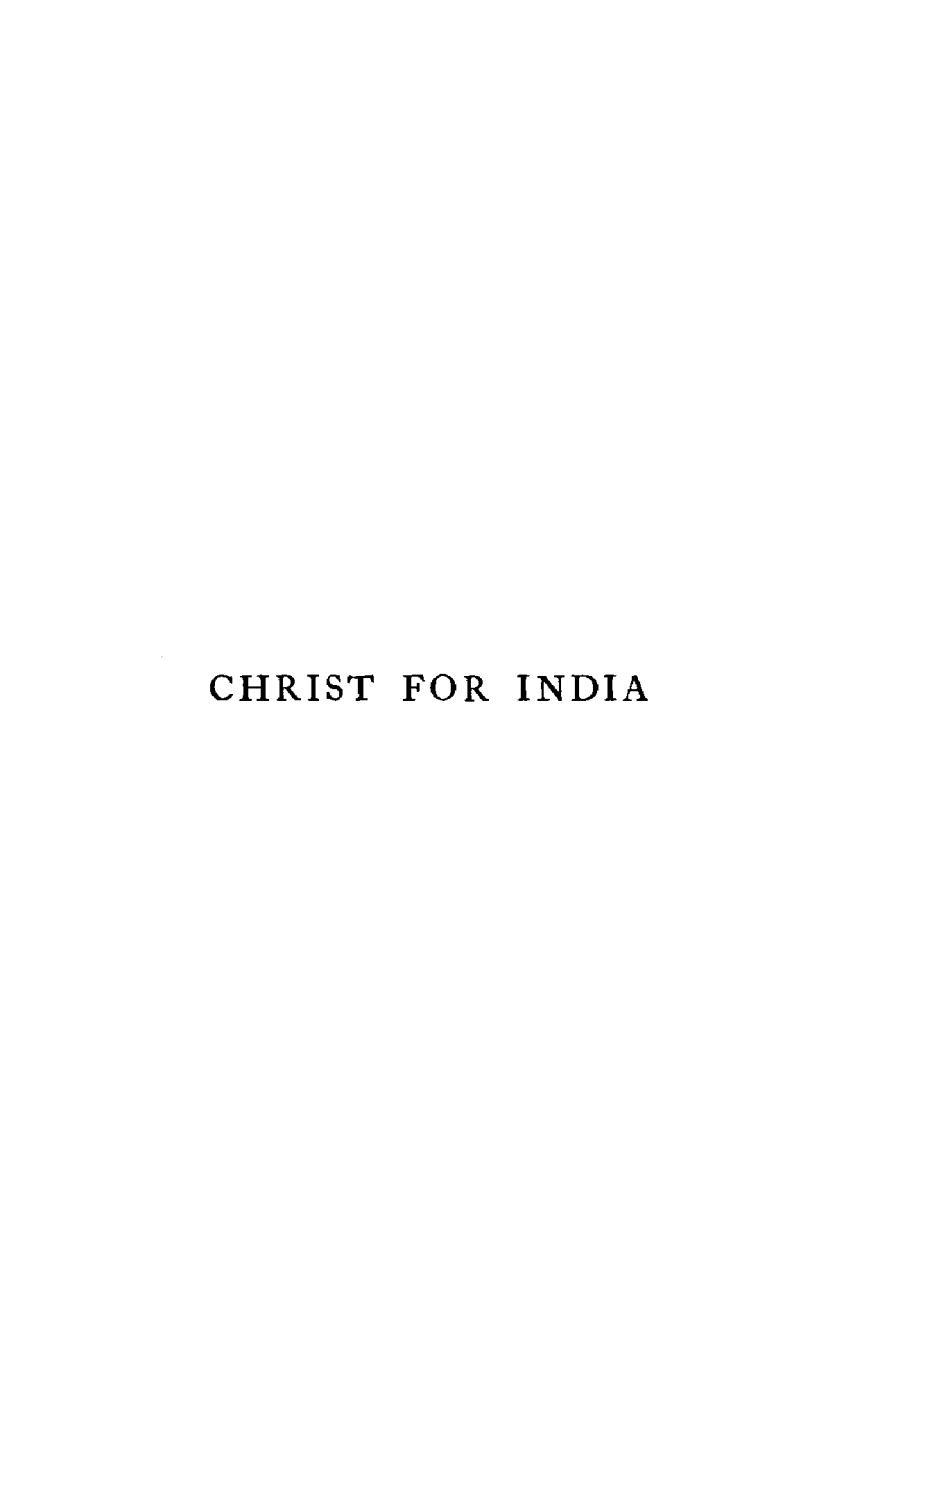 Bernard Lucas [1860-1920], Christ For India  by Rob Bradshaw